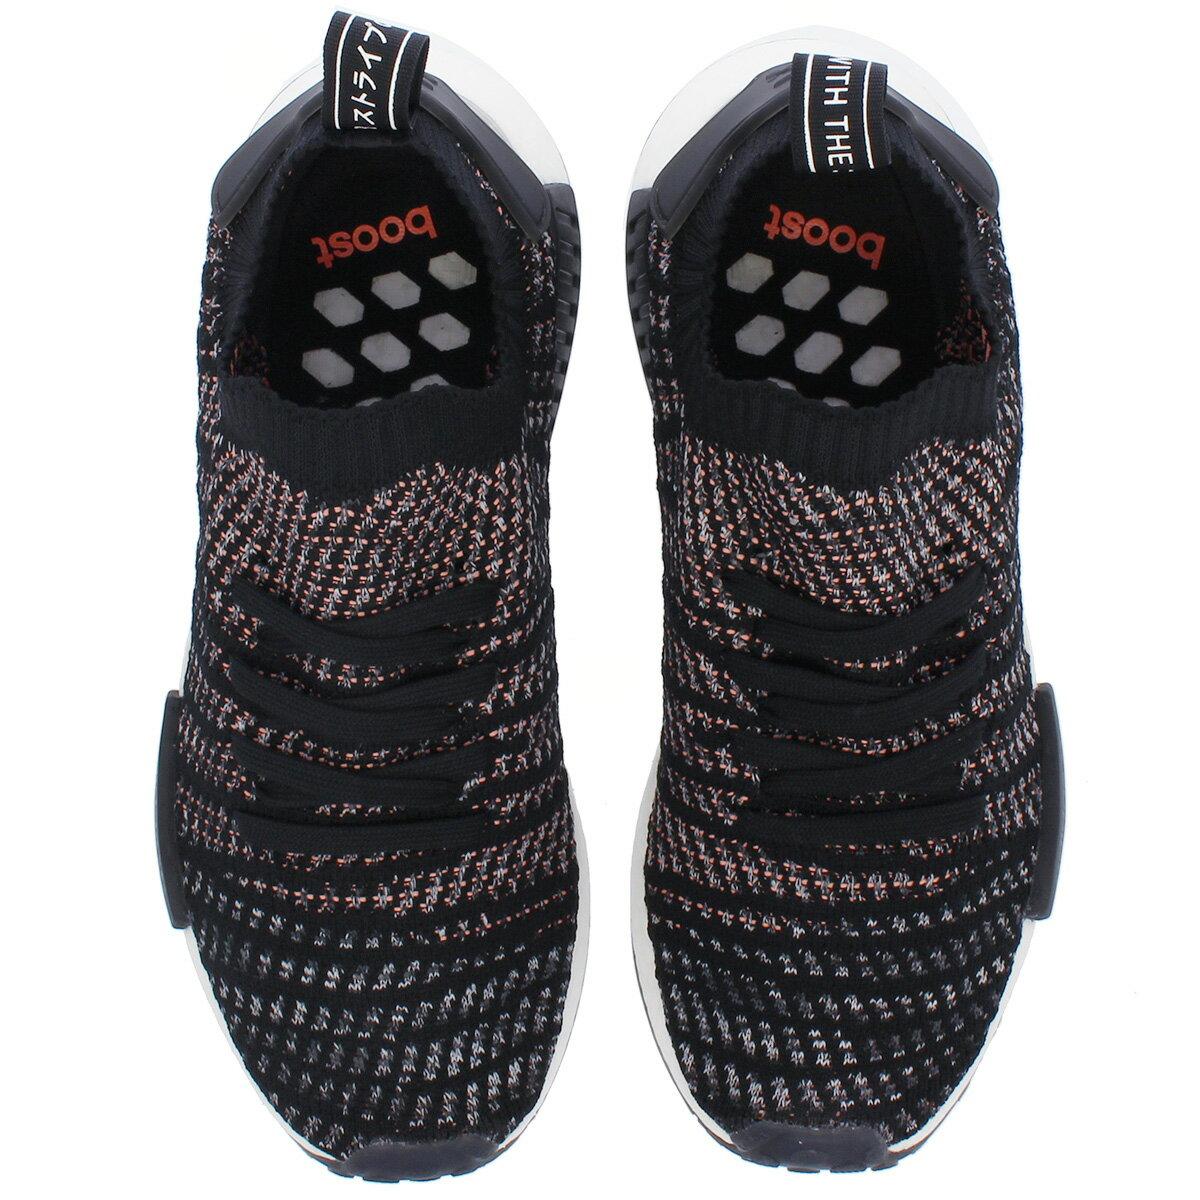 adidas NMD_R1 STLT PK Adidas NMD R1 STLT PK CORE BLACKGREY FIVEGREY TWO b37636